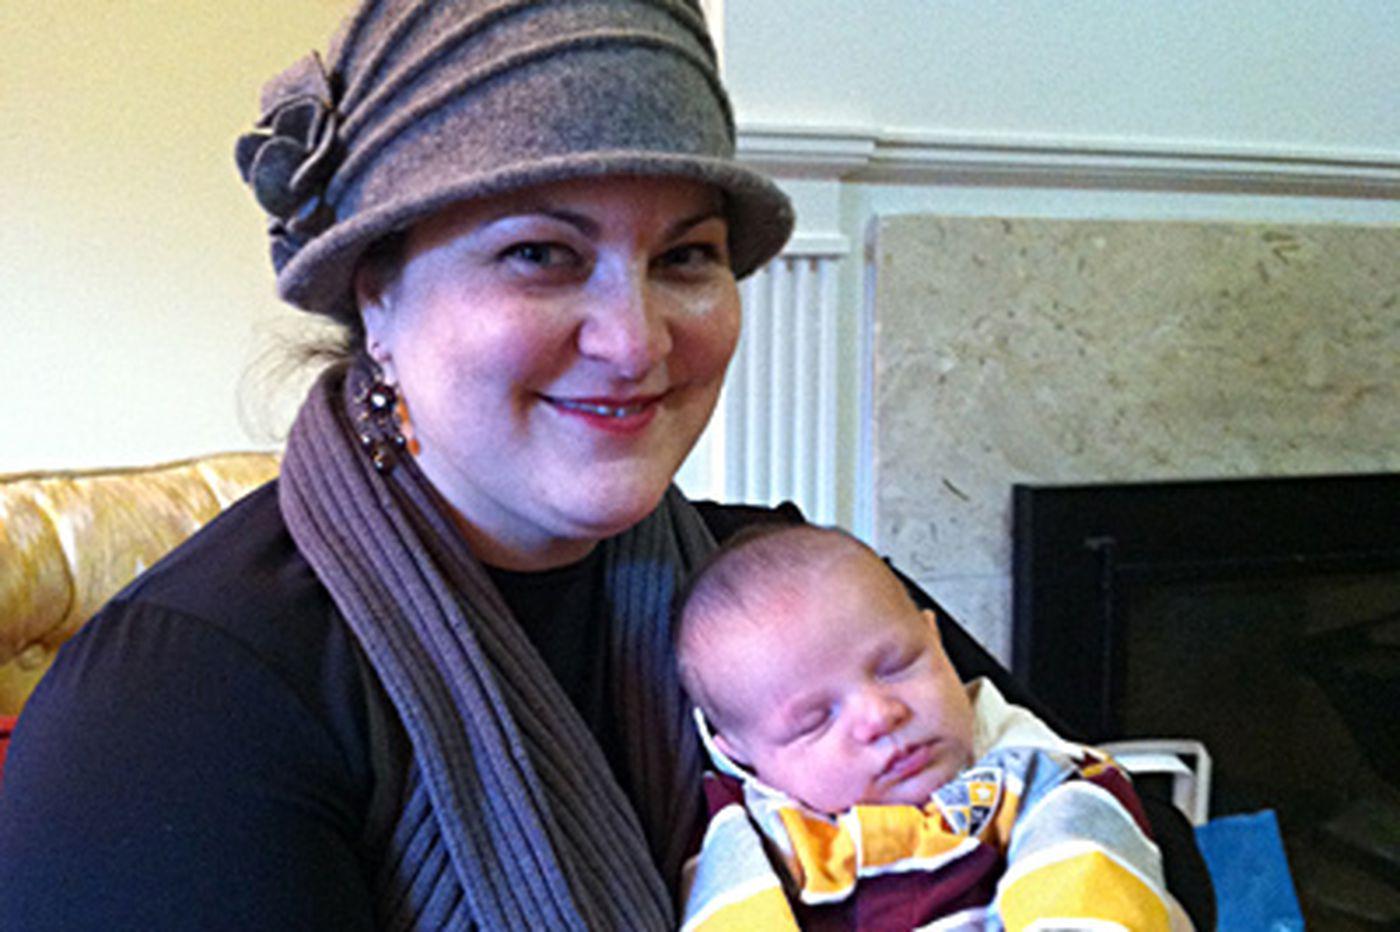 Professional care amid the closing of Lower Bucks maternity ward